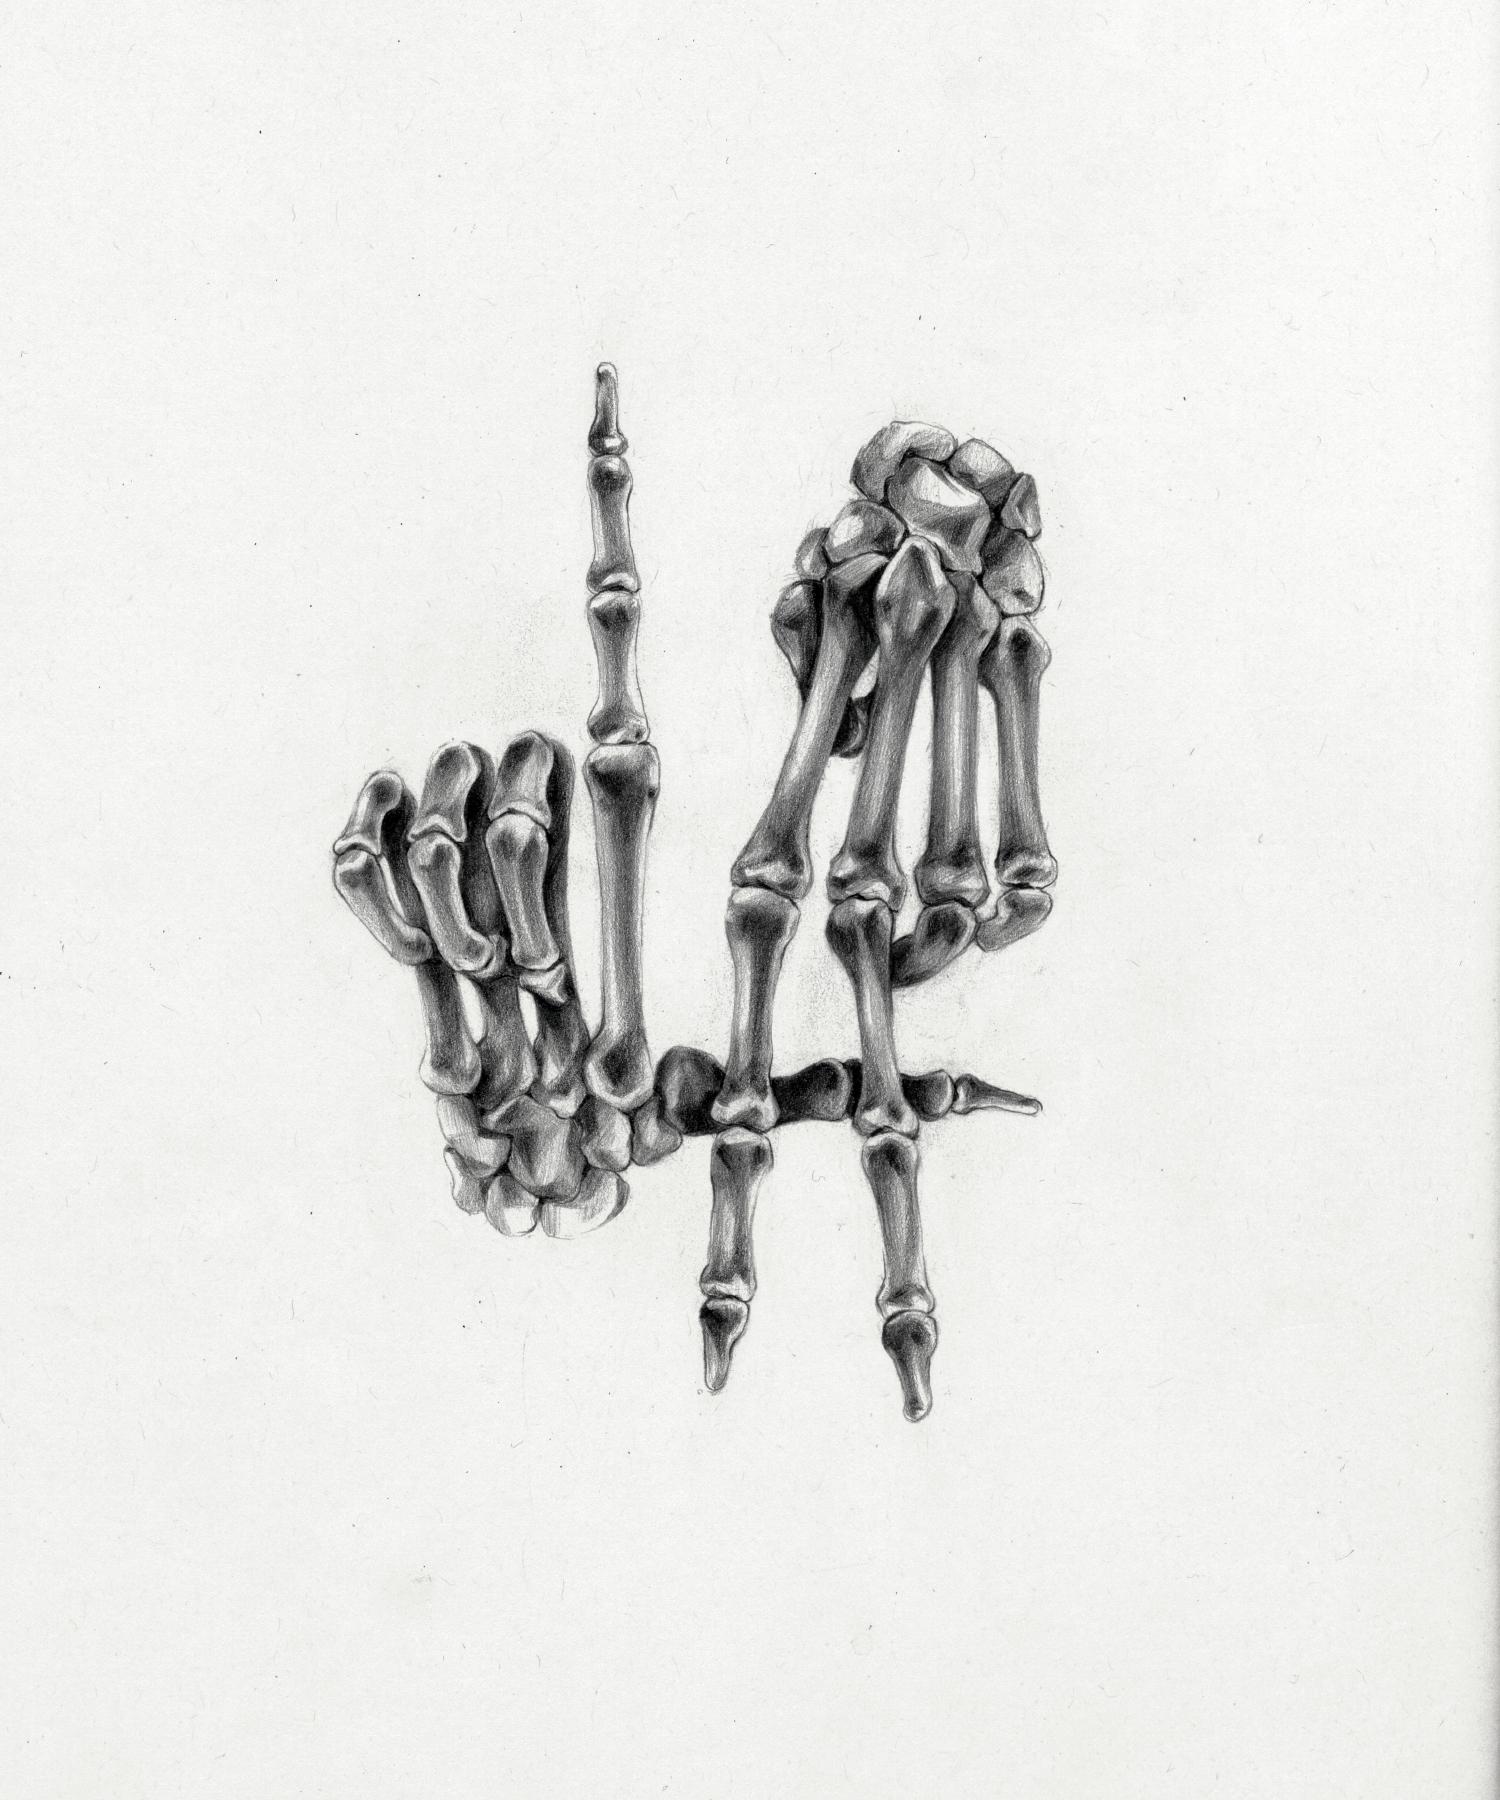 Skeleton-Hand-LA_01.jpg